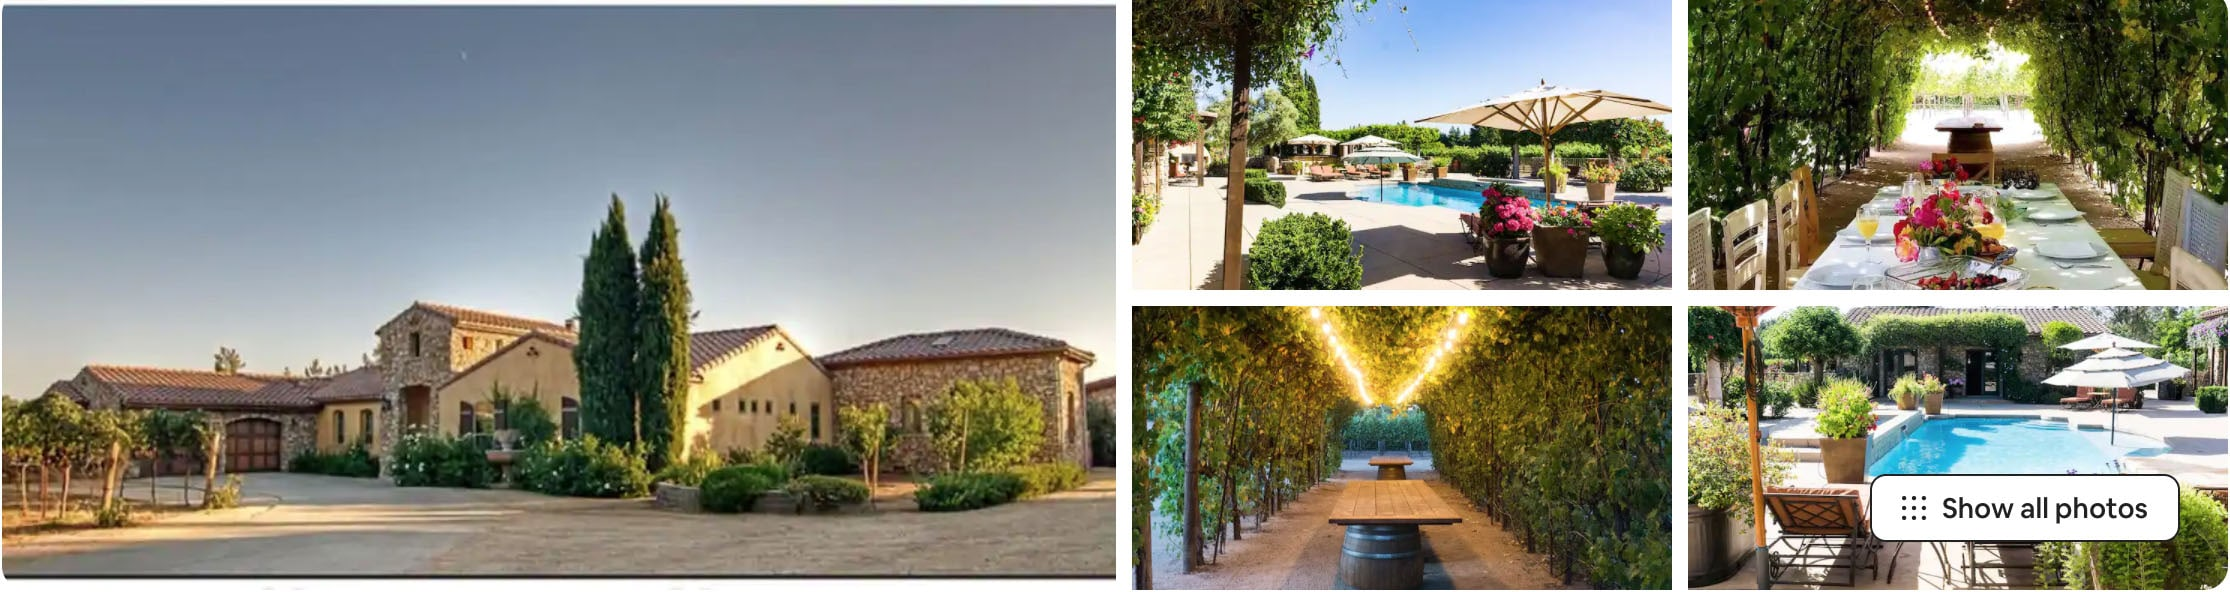 Northern California Airbnb wedding venue Villa Riposo